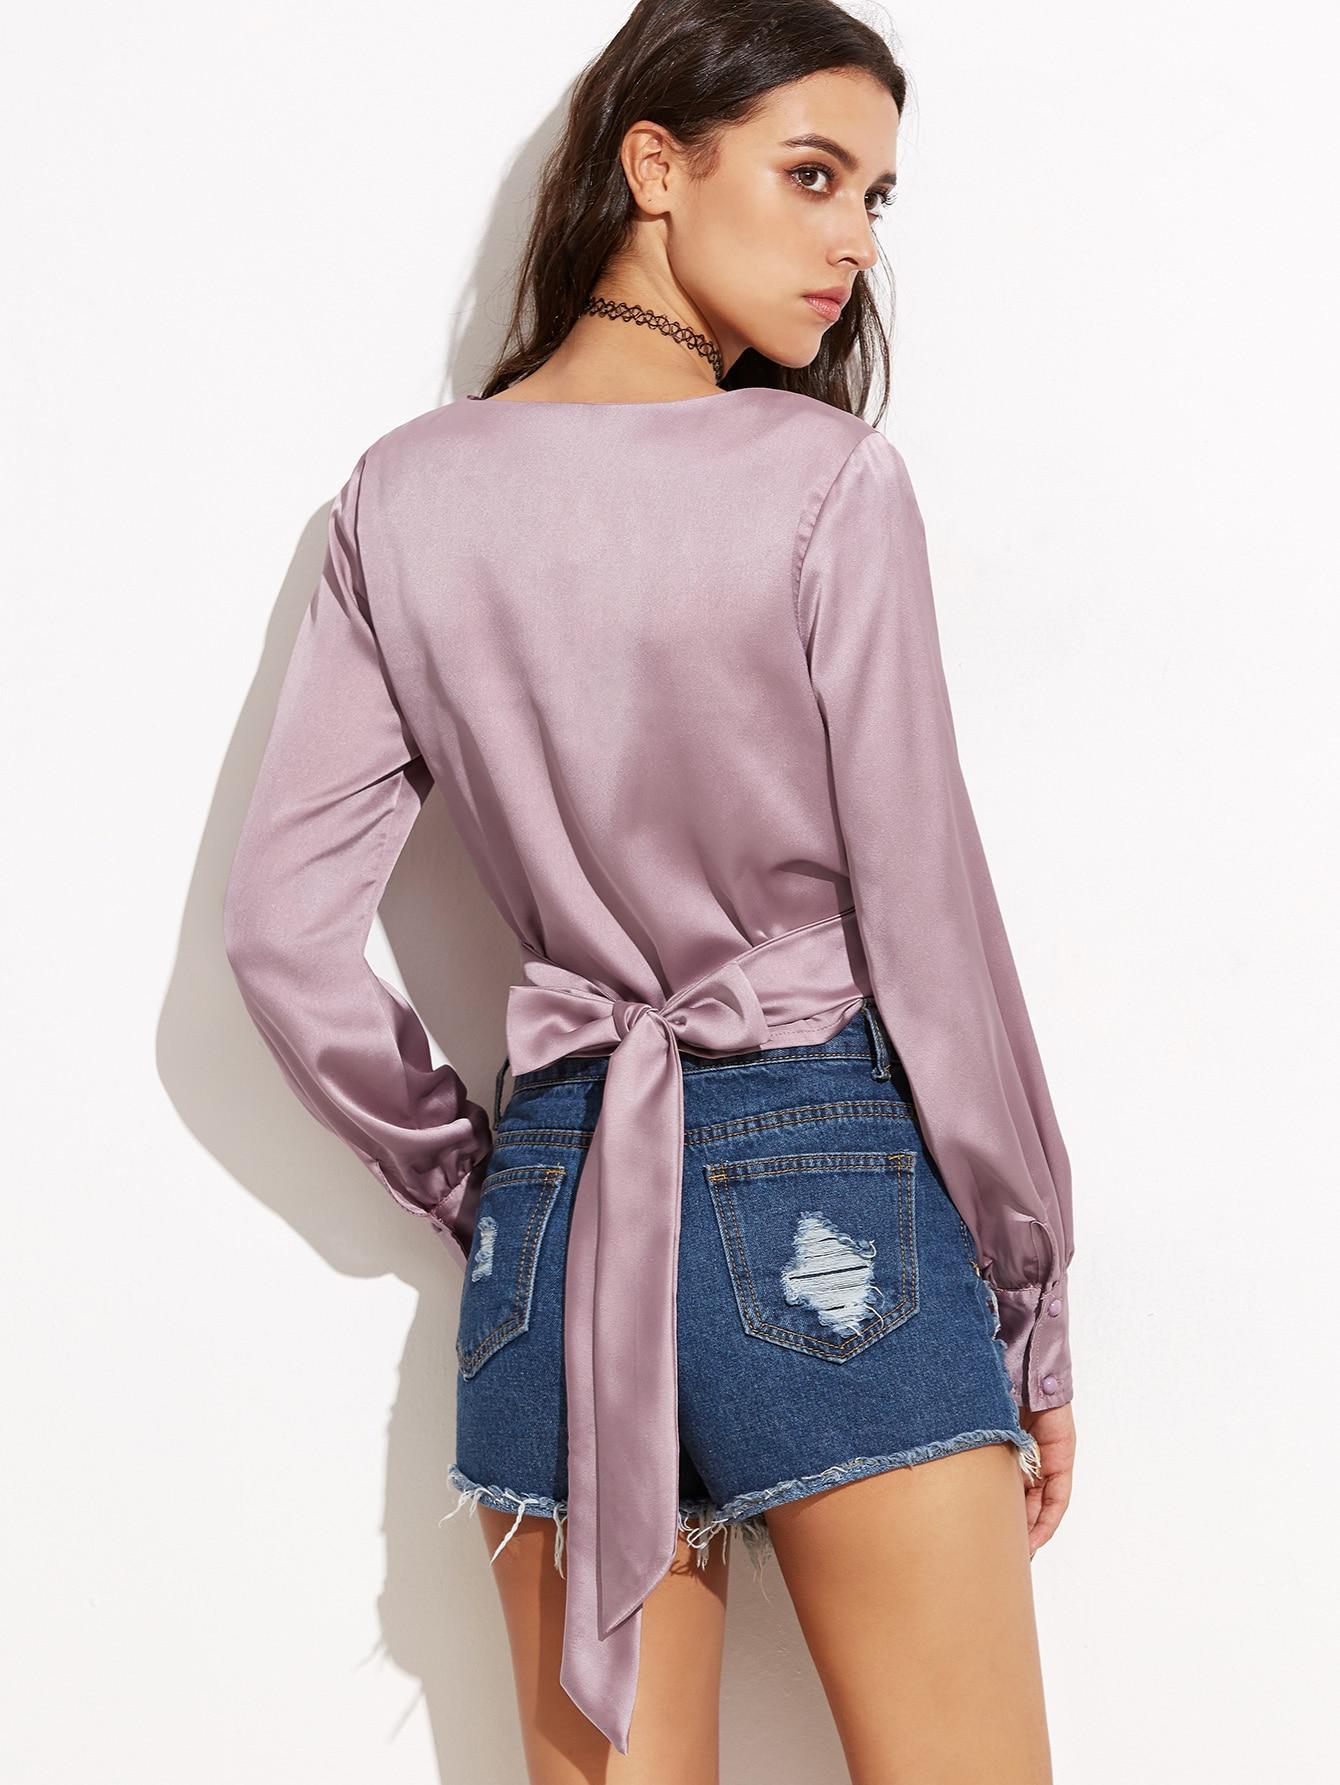 blouse160902702_2